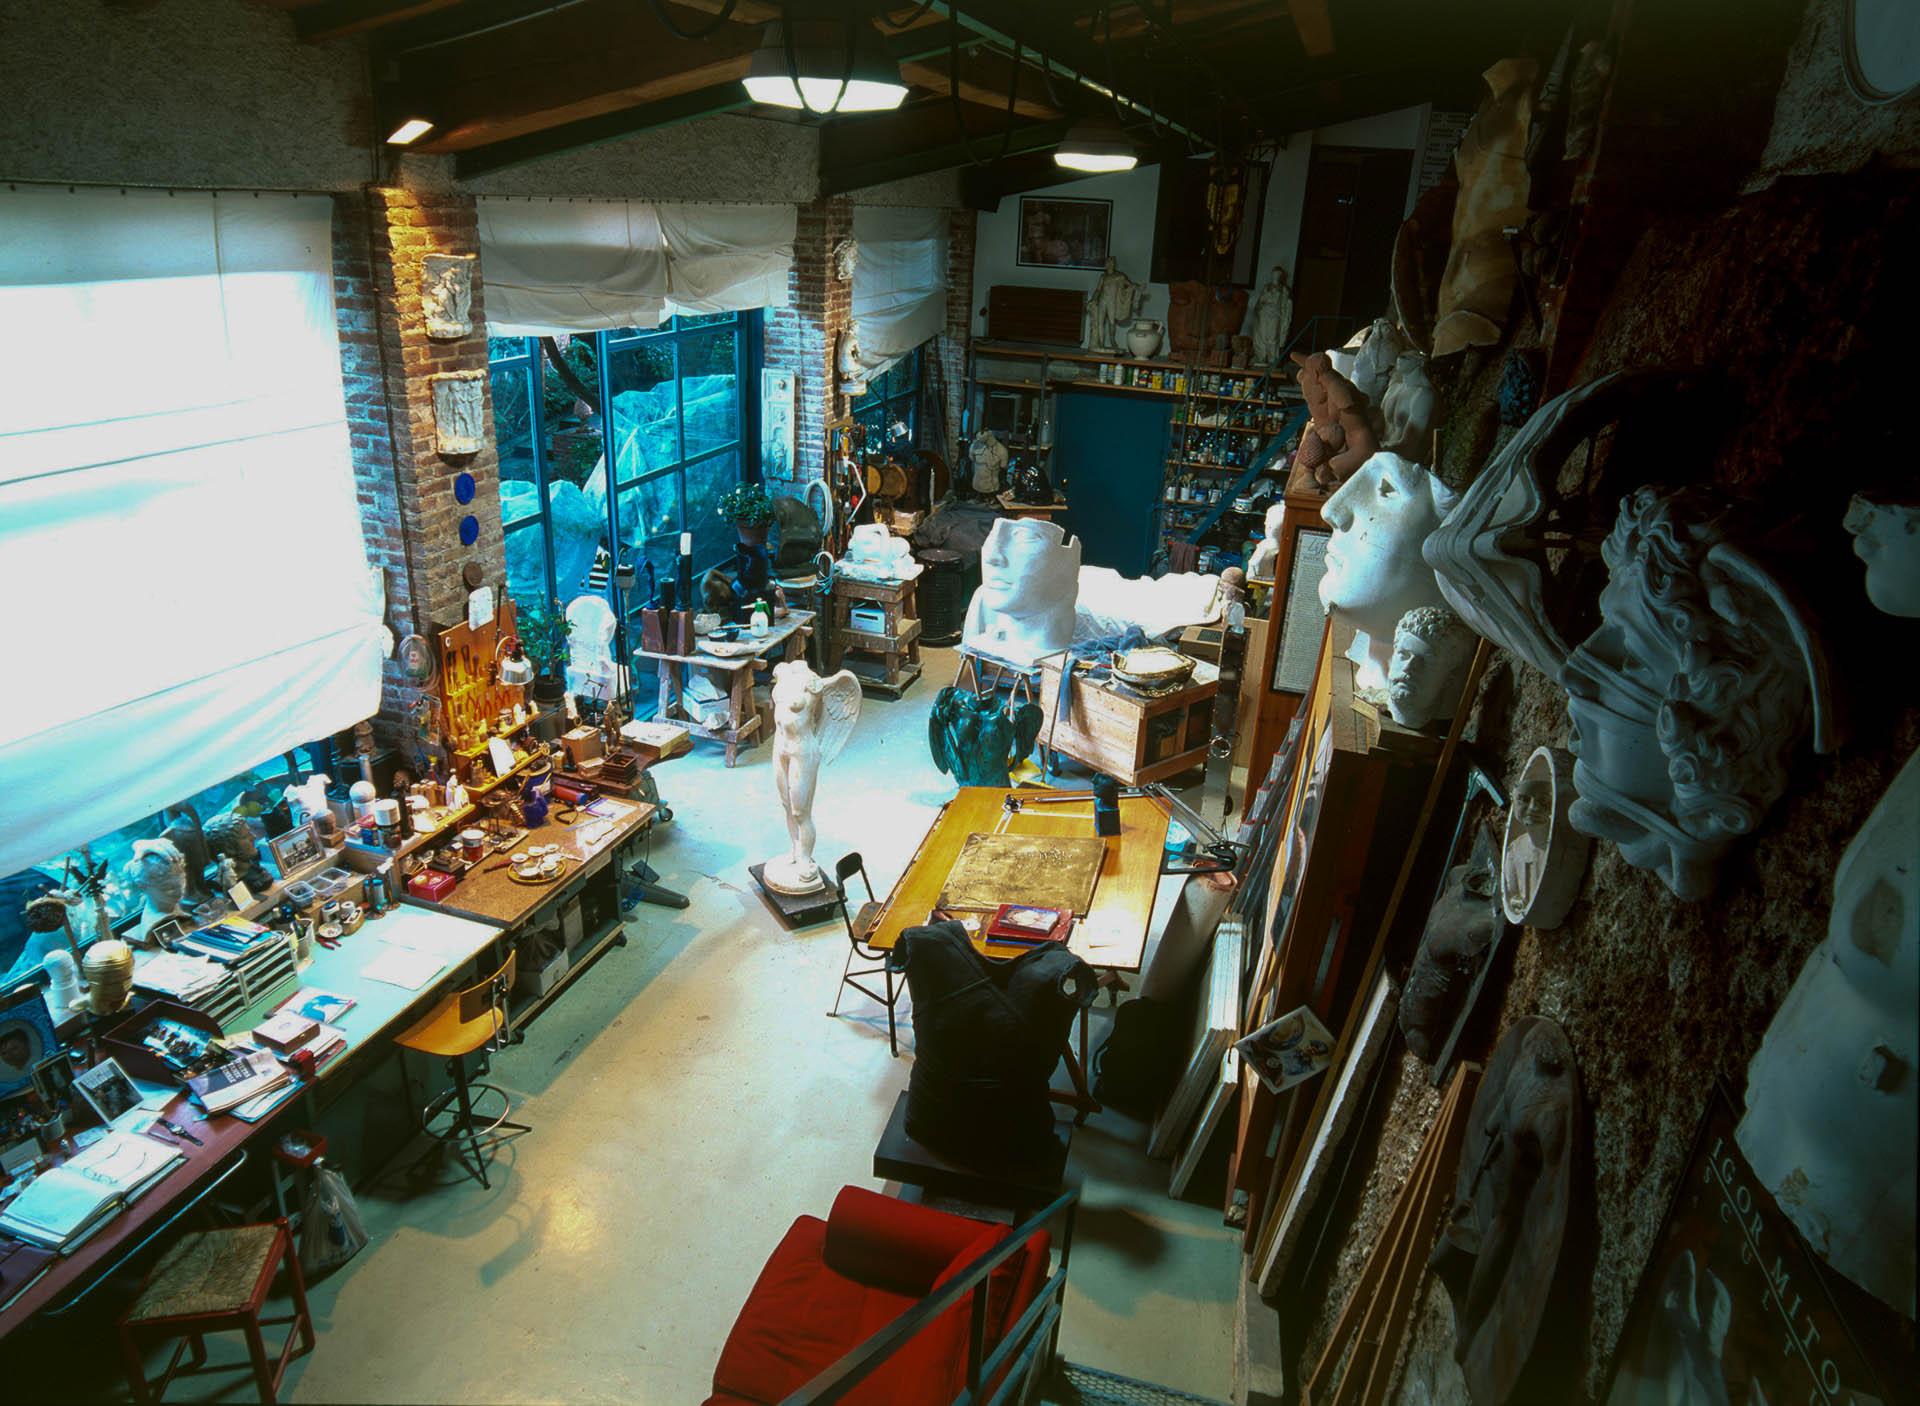 Pietrasanta, Italy - February 10, 2000Polish sculptor Igor Mitoraj.© GIANNI GIANSANTI